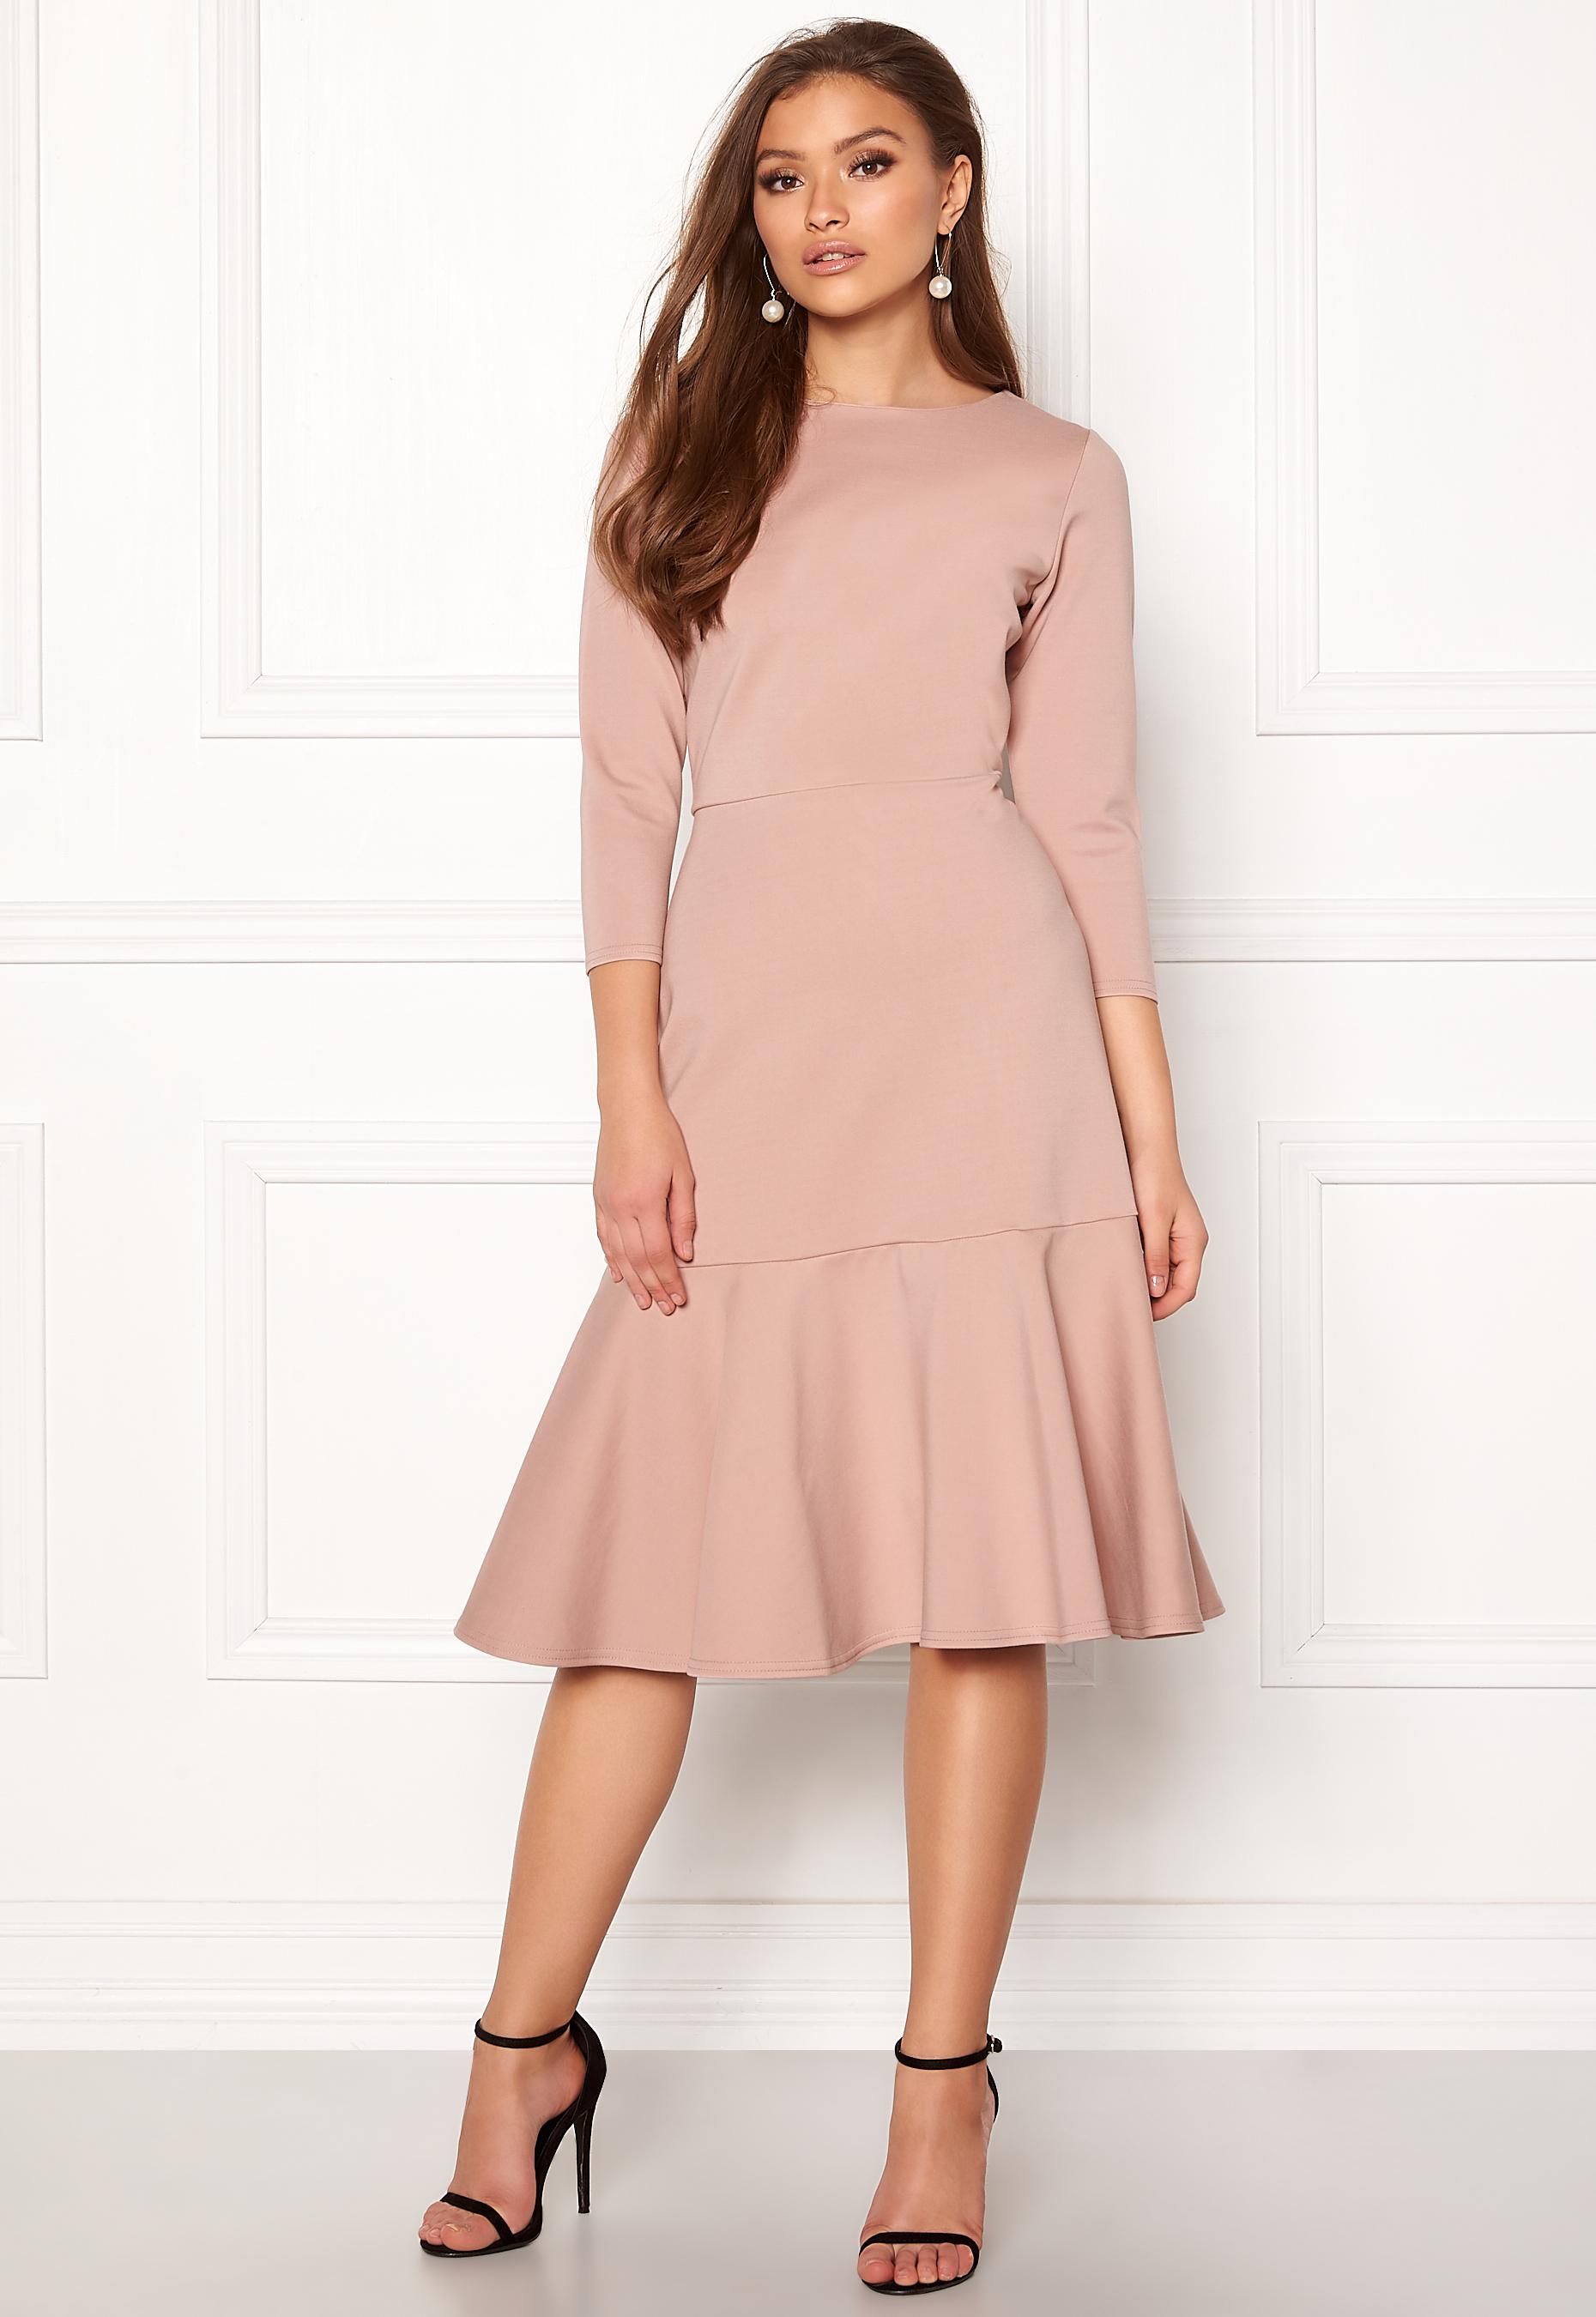 Closet London Long Sleeve Peplum Dress Nude Bubbleroom